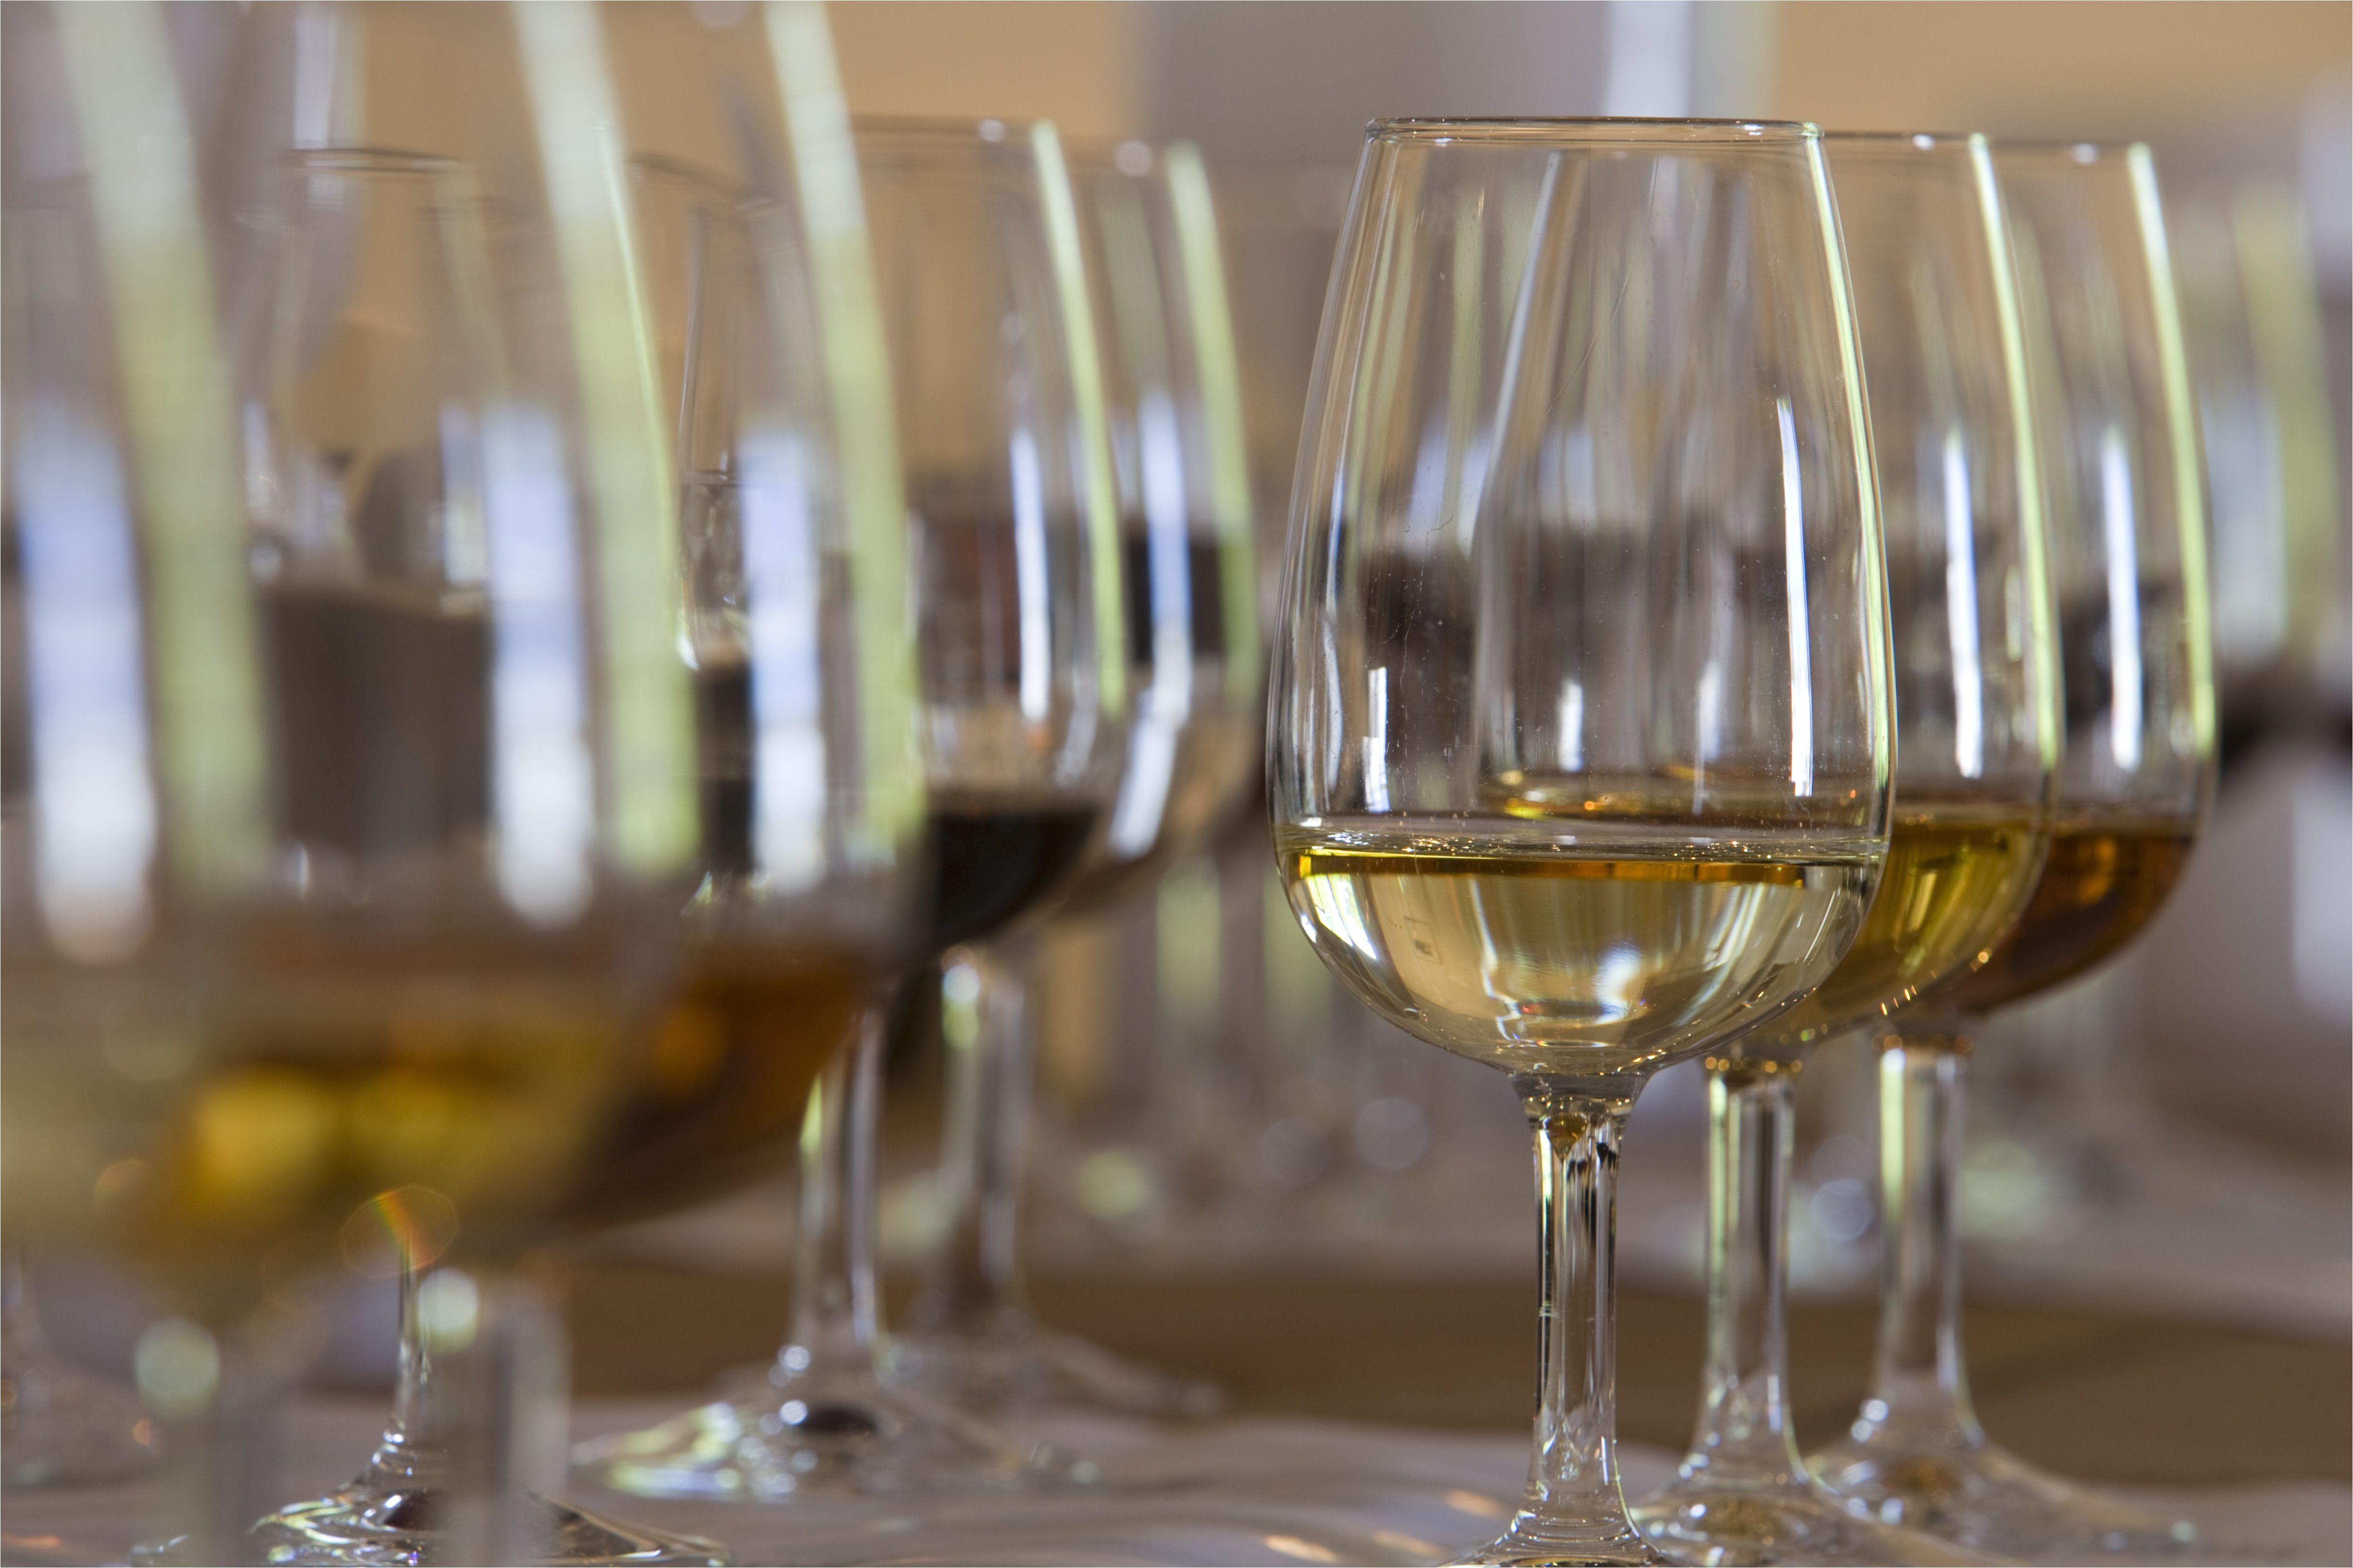 sherry tasting at bodega tio pepe gonzales byass 148507405 590c882c5f9b5864701041e5 jpg